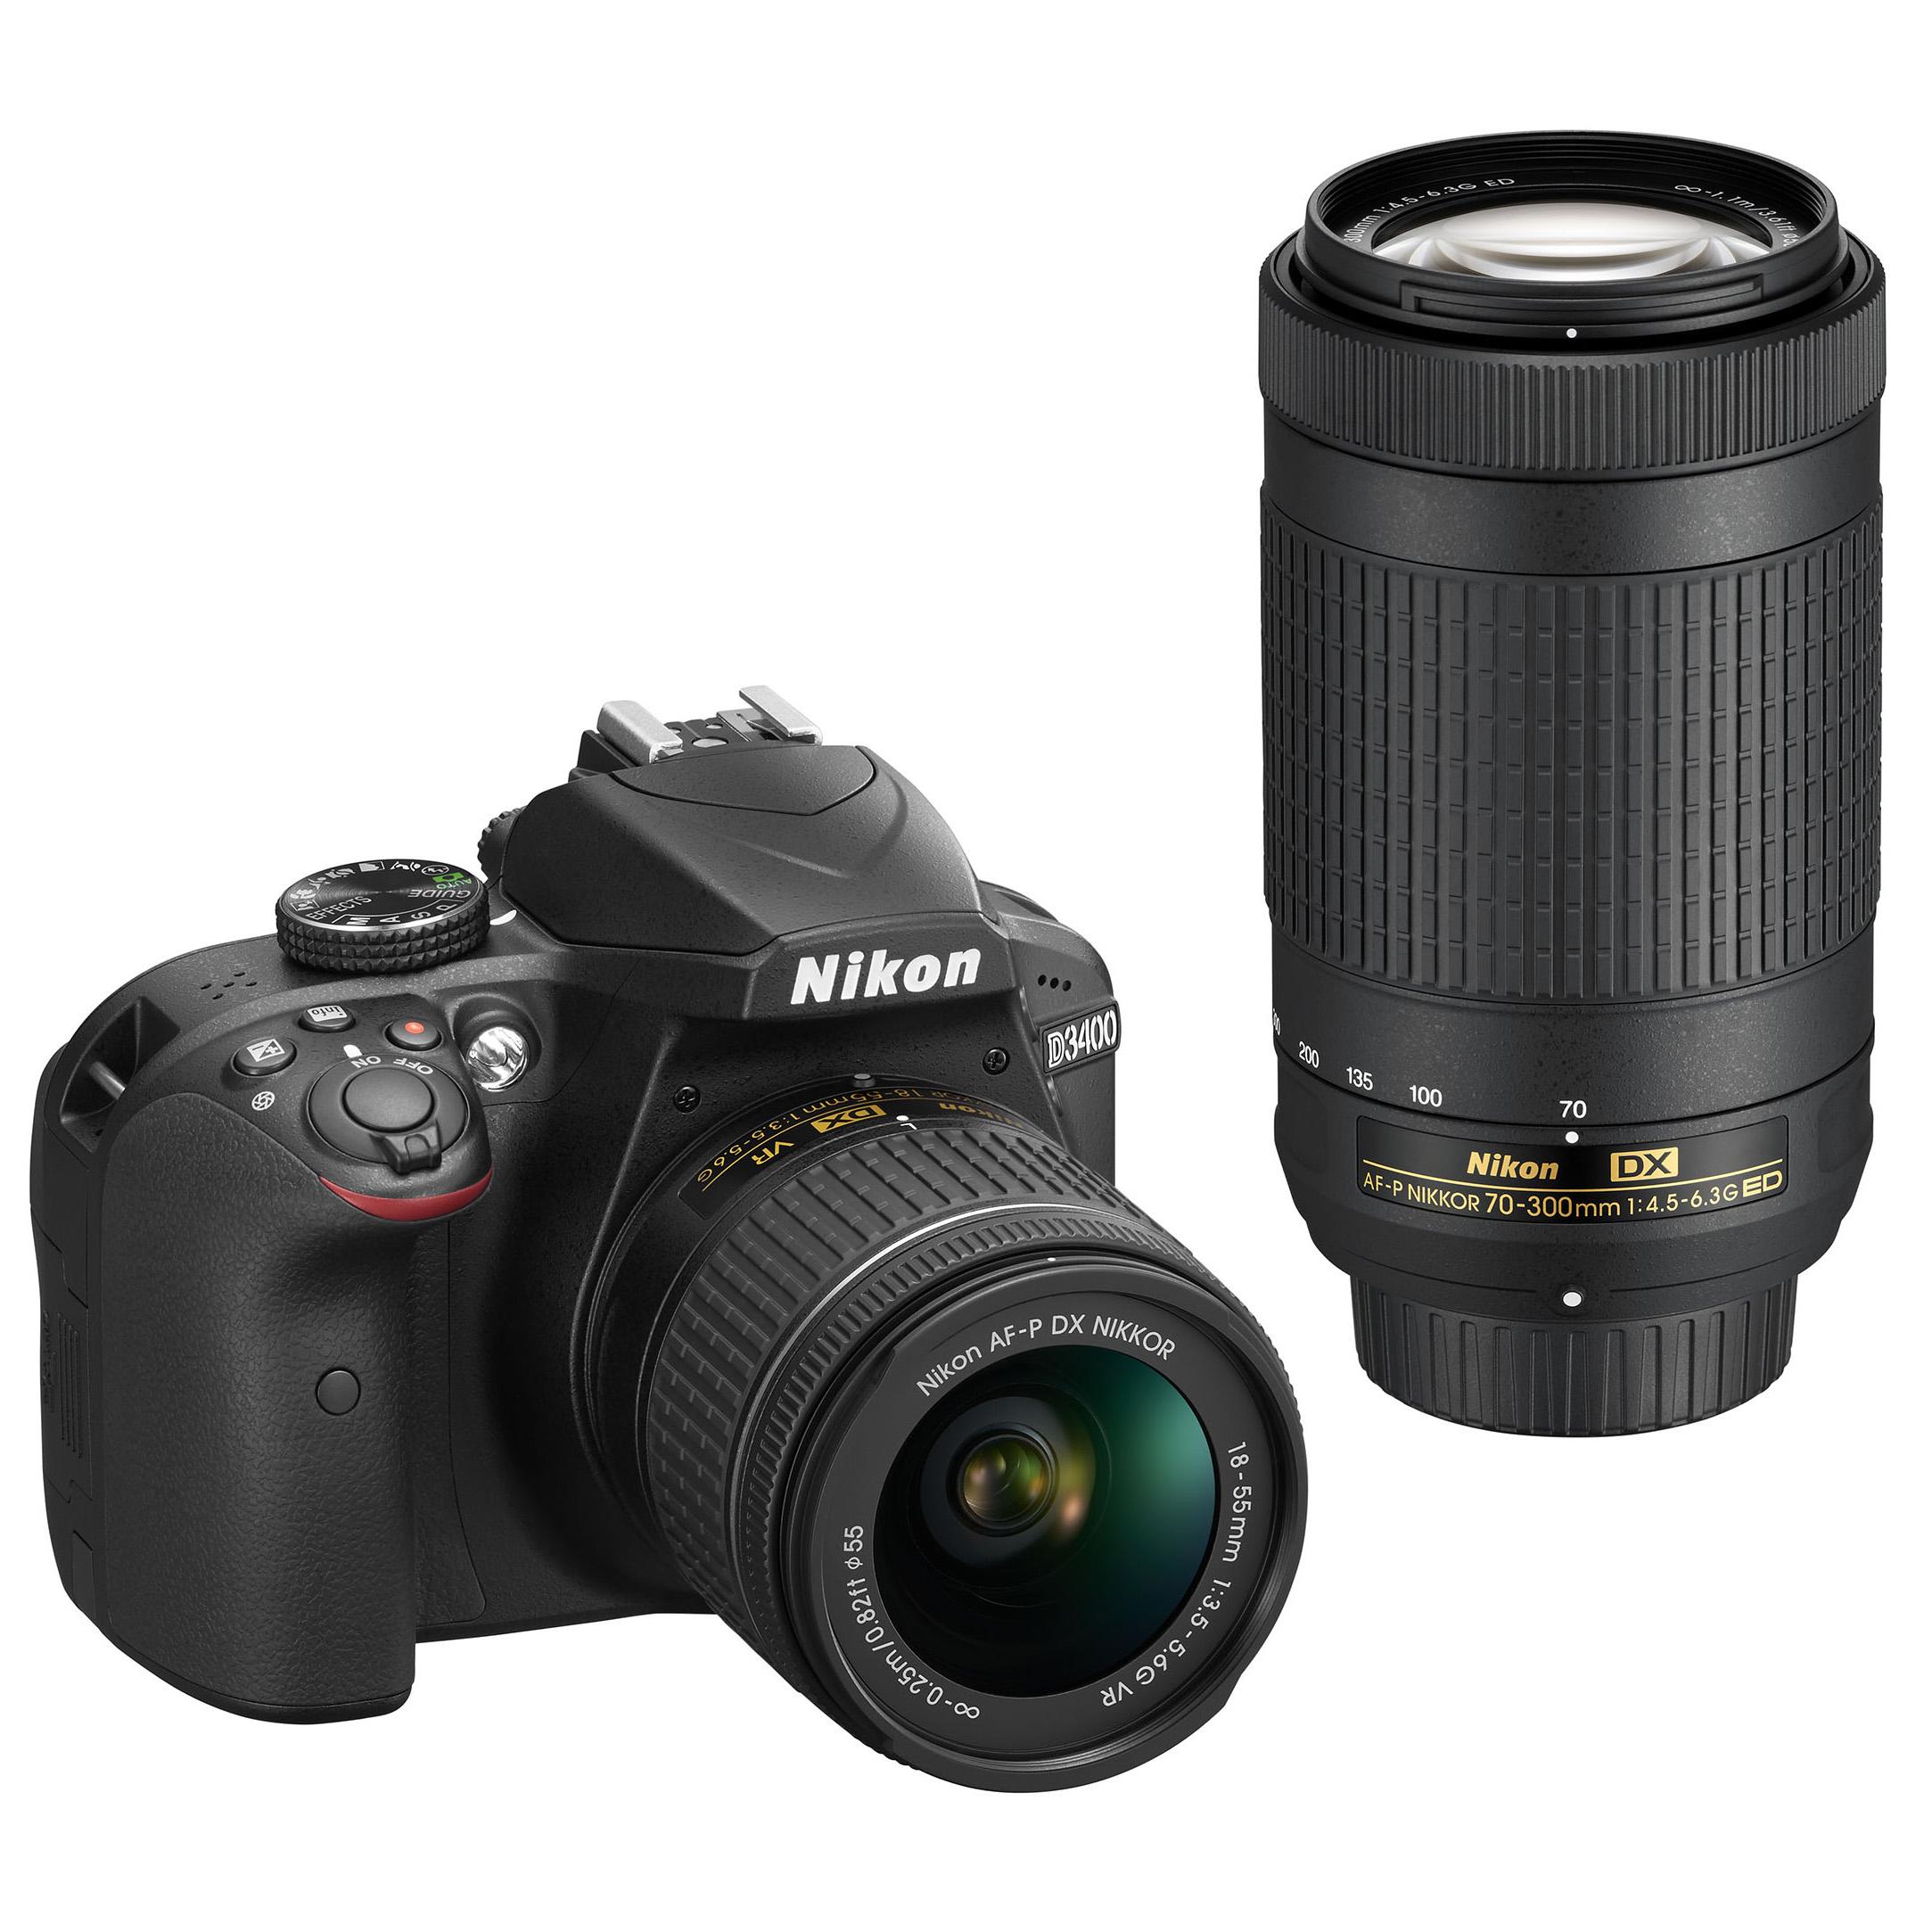 Nikon D3400 overview  sc 1 st  Bu0026H & Nikon D3400 DSLR Camera with 18-55mm Lens (Red) 1572 Bu0026H Photo azcodes.com